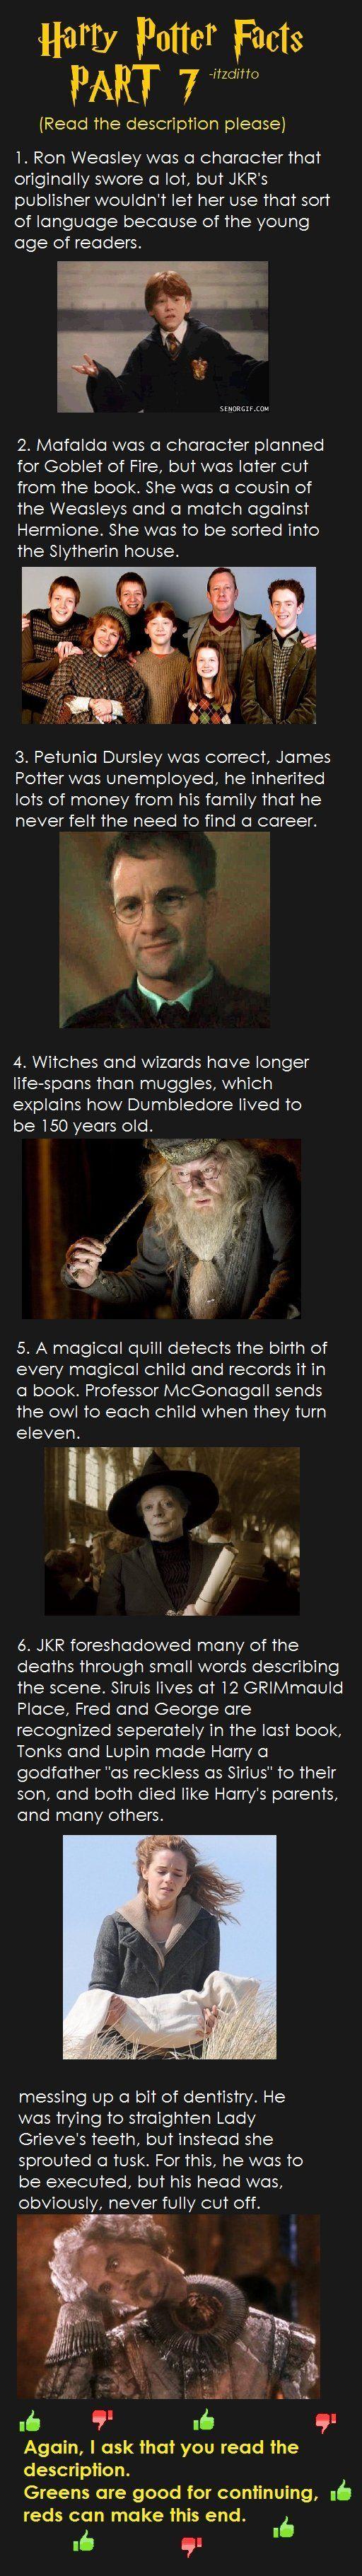 Harry Potter Facts Part 7 -